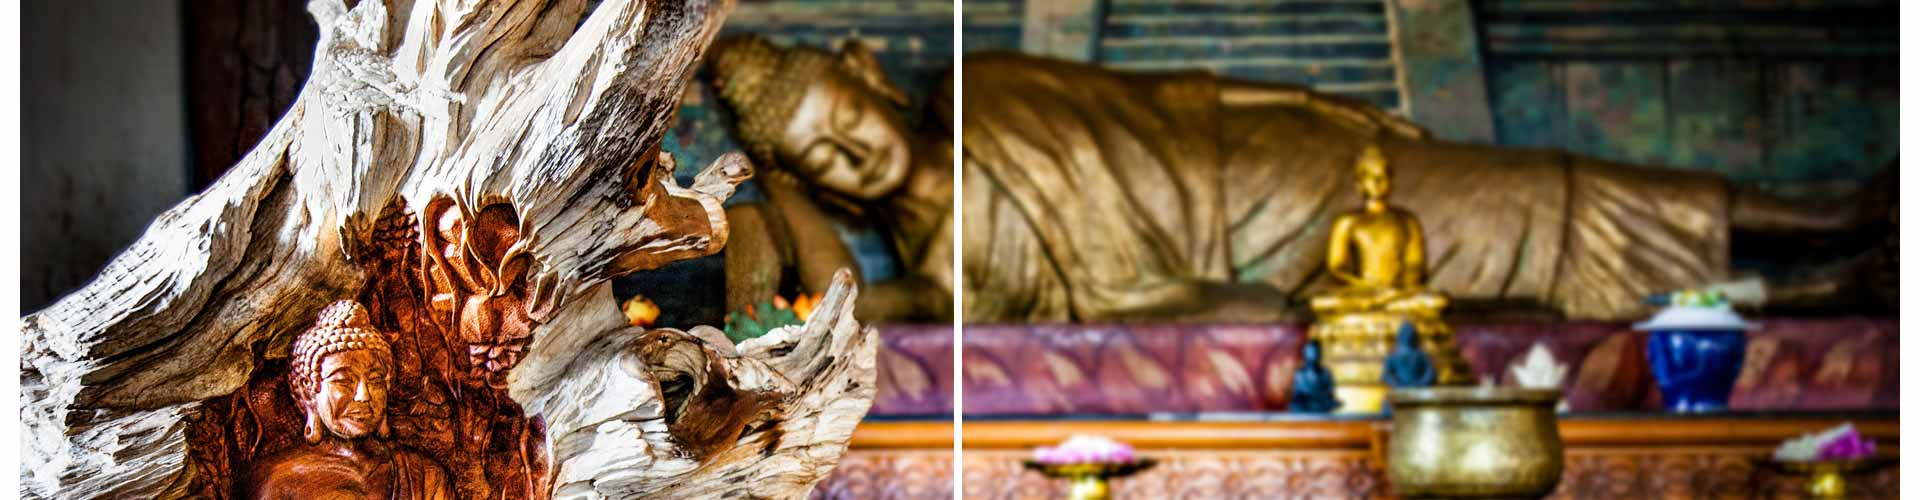 reisetagebuch bali buddha